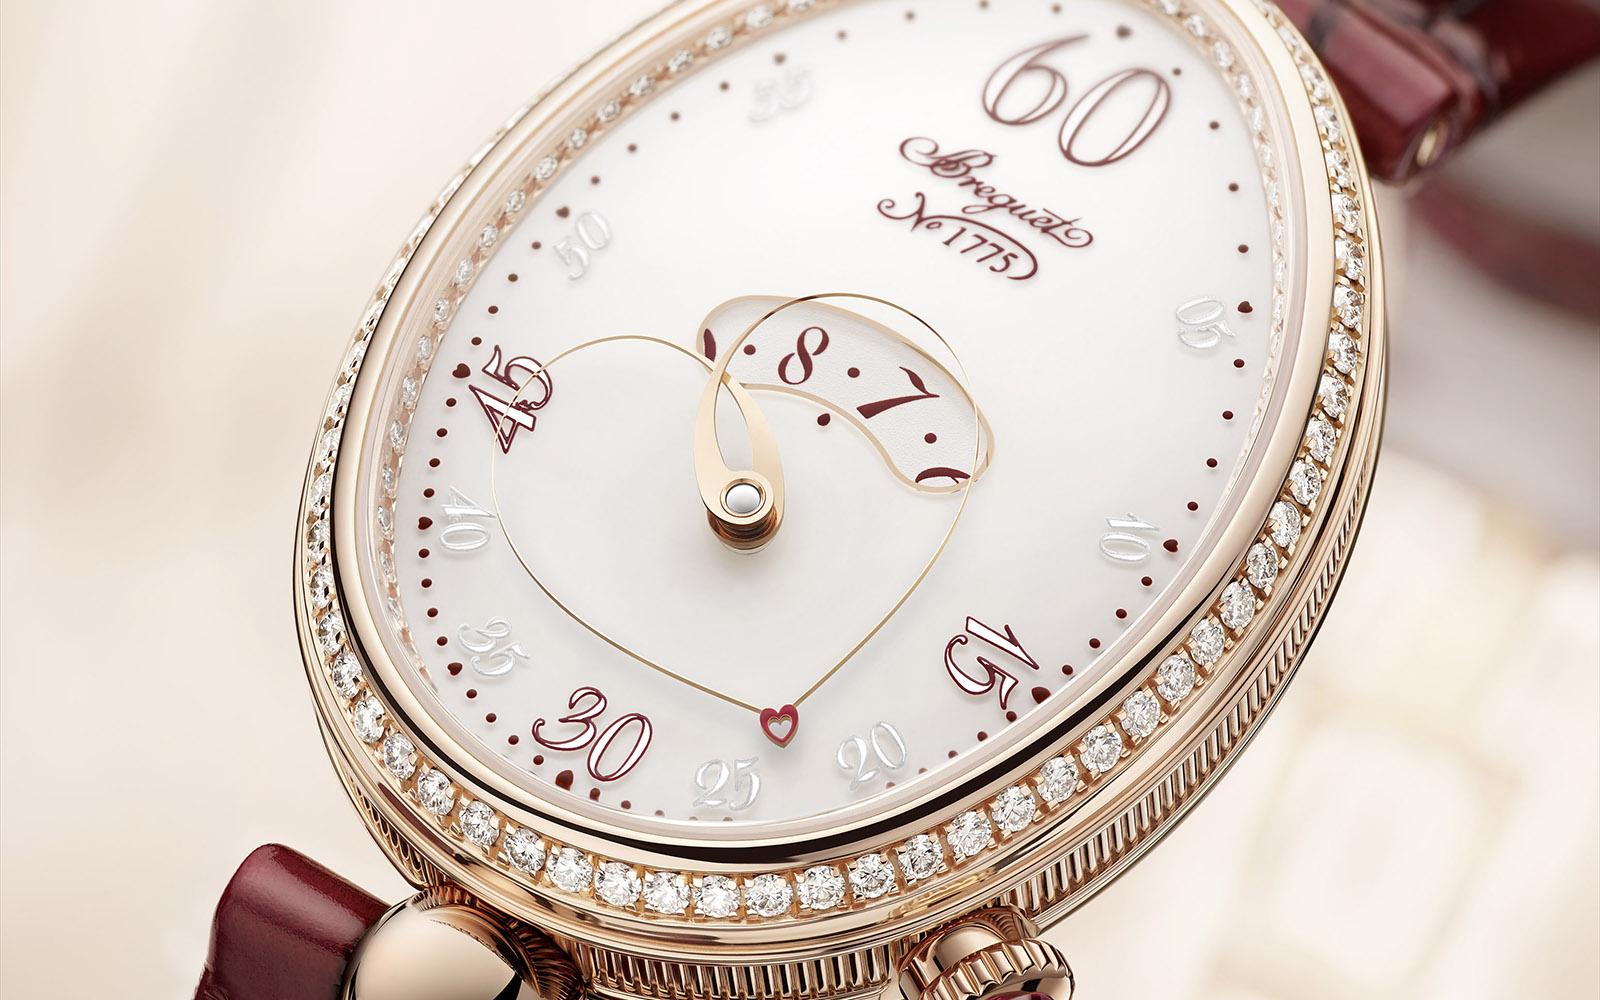 Breguetâs Latest Reine de Naples Watch Counts Minutes with a Beating Heart post thumbnail image